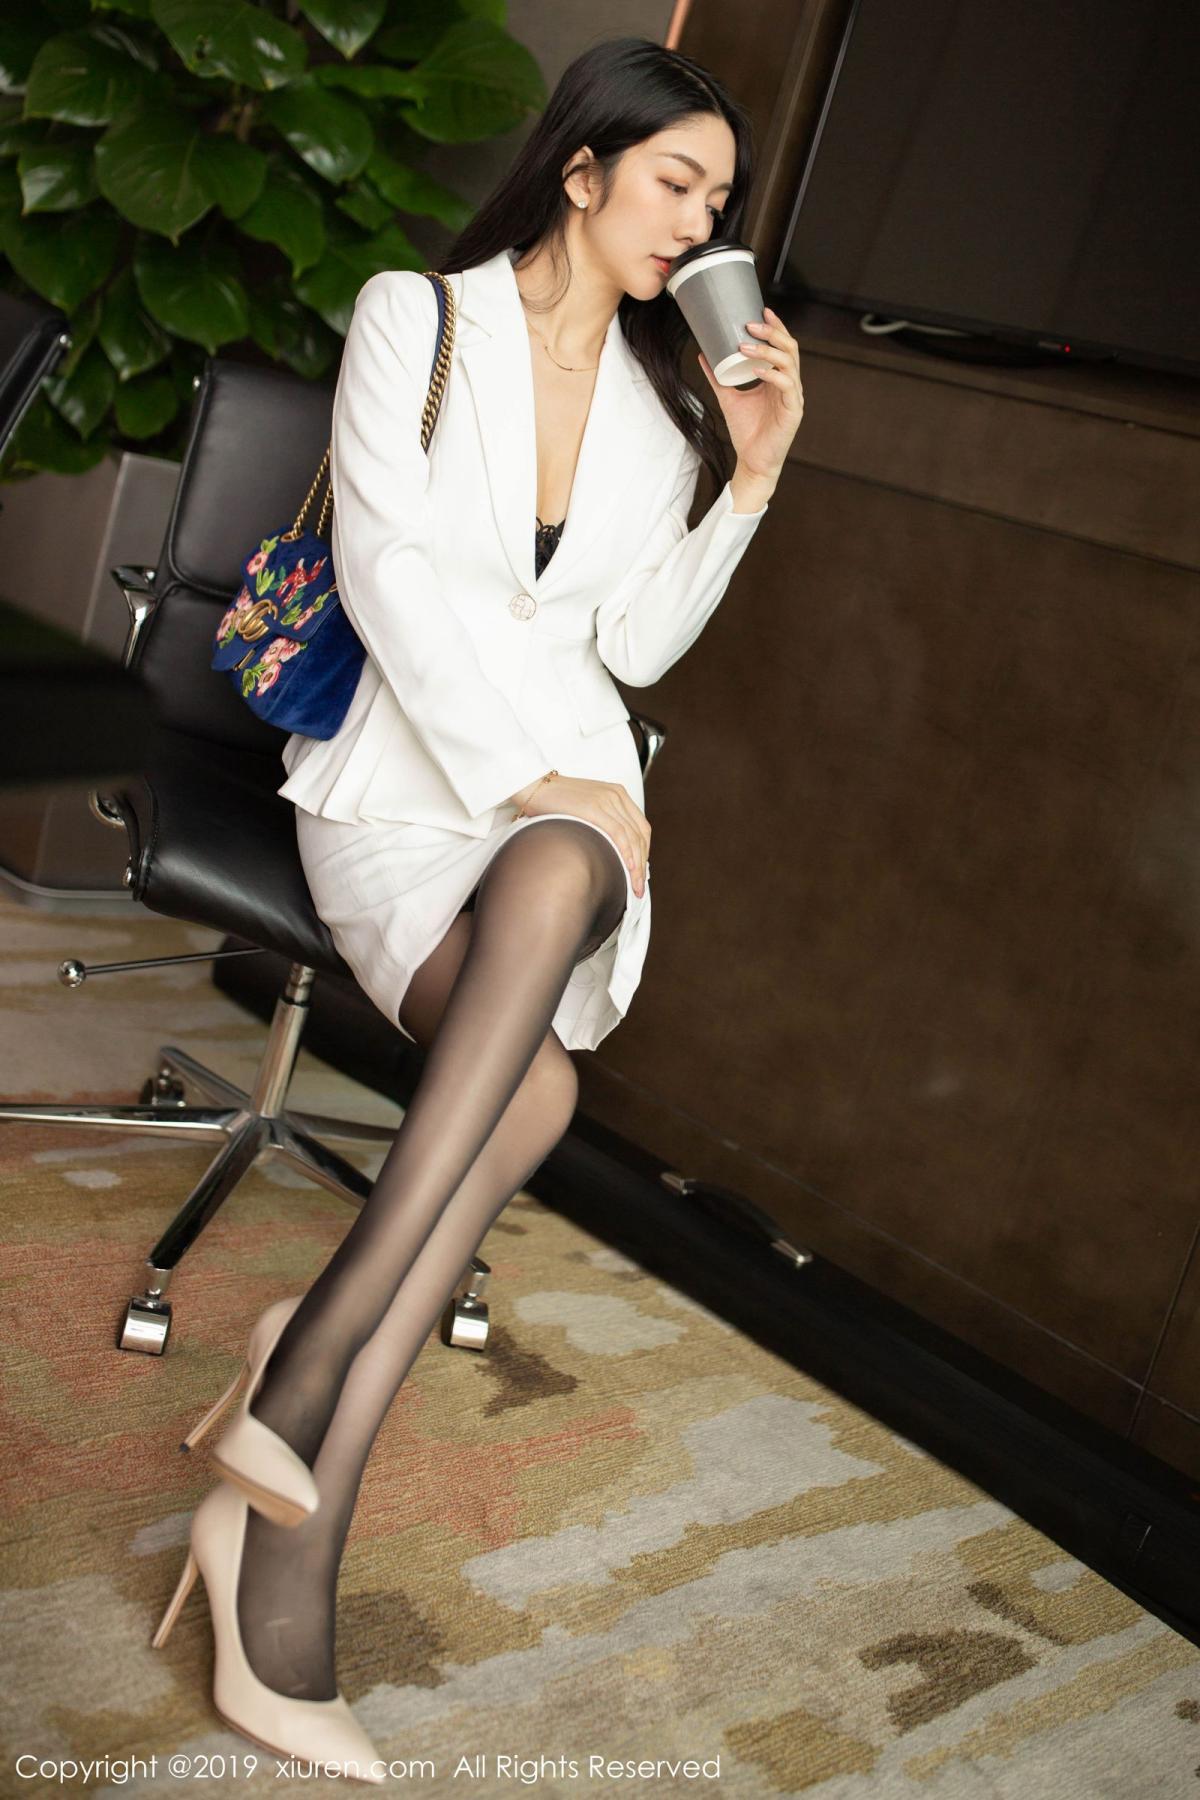 [XiuRen] Vol.1821 Come to my room and sit after you get off work 1P, Black Silk, Di Yi, Xiuren